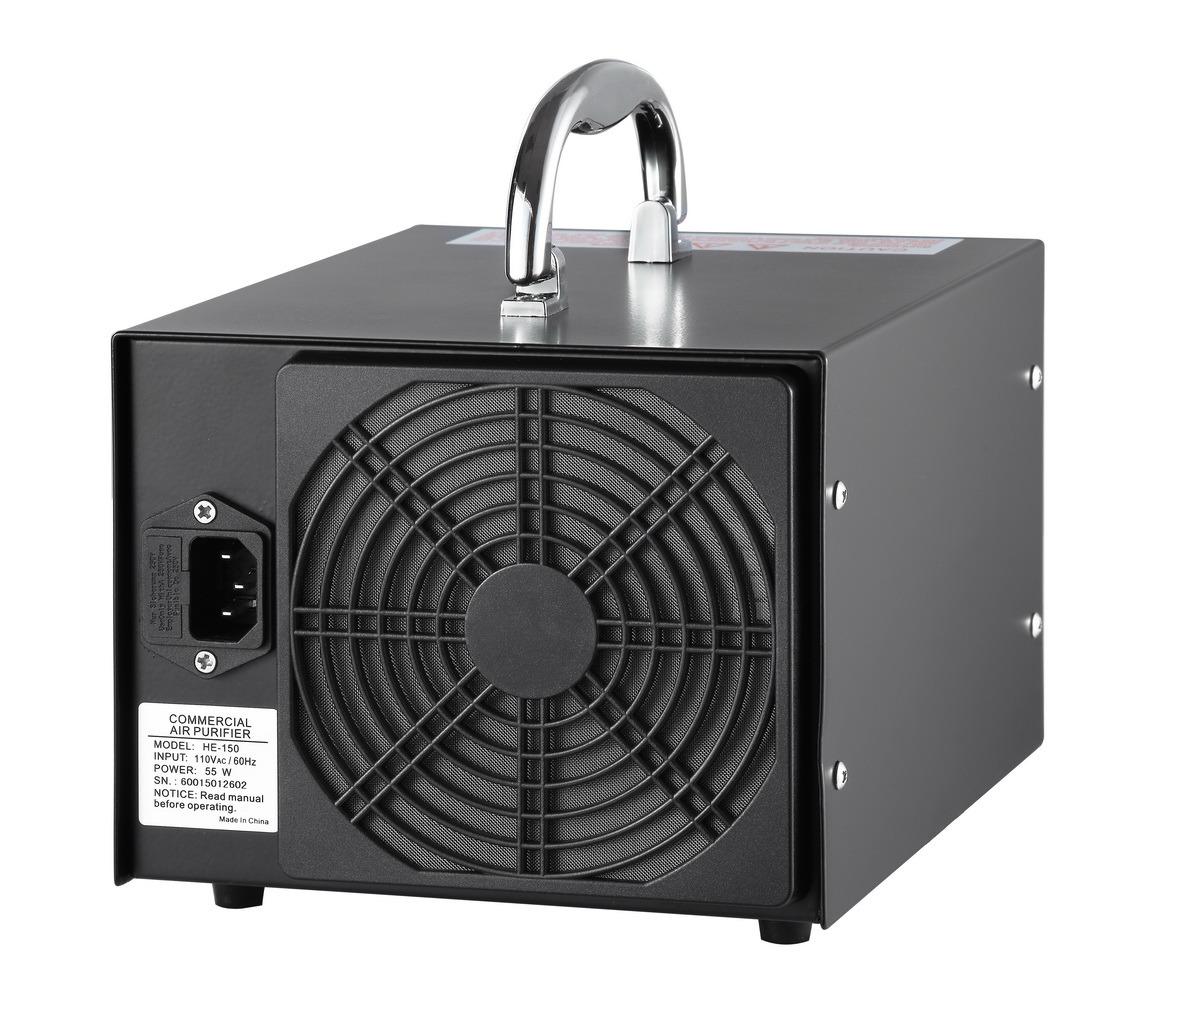 3.5g Portable Ozone Generator Air Purifier